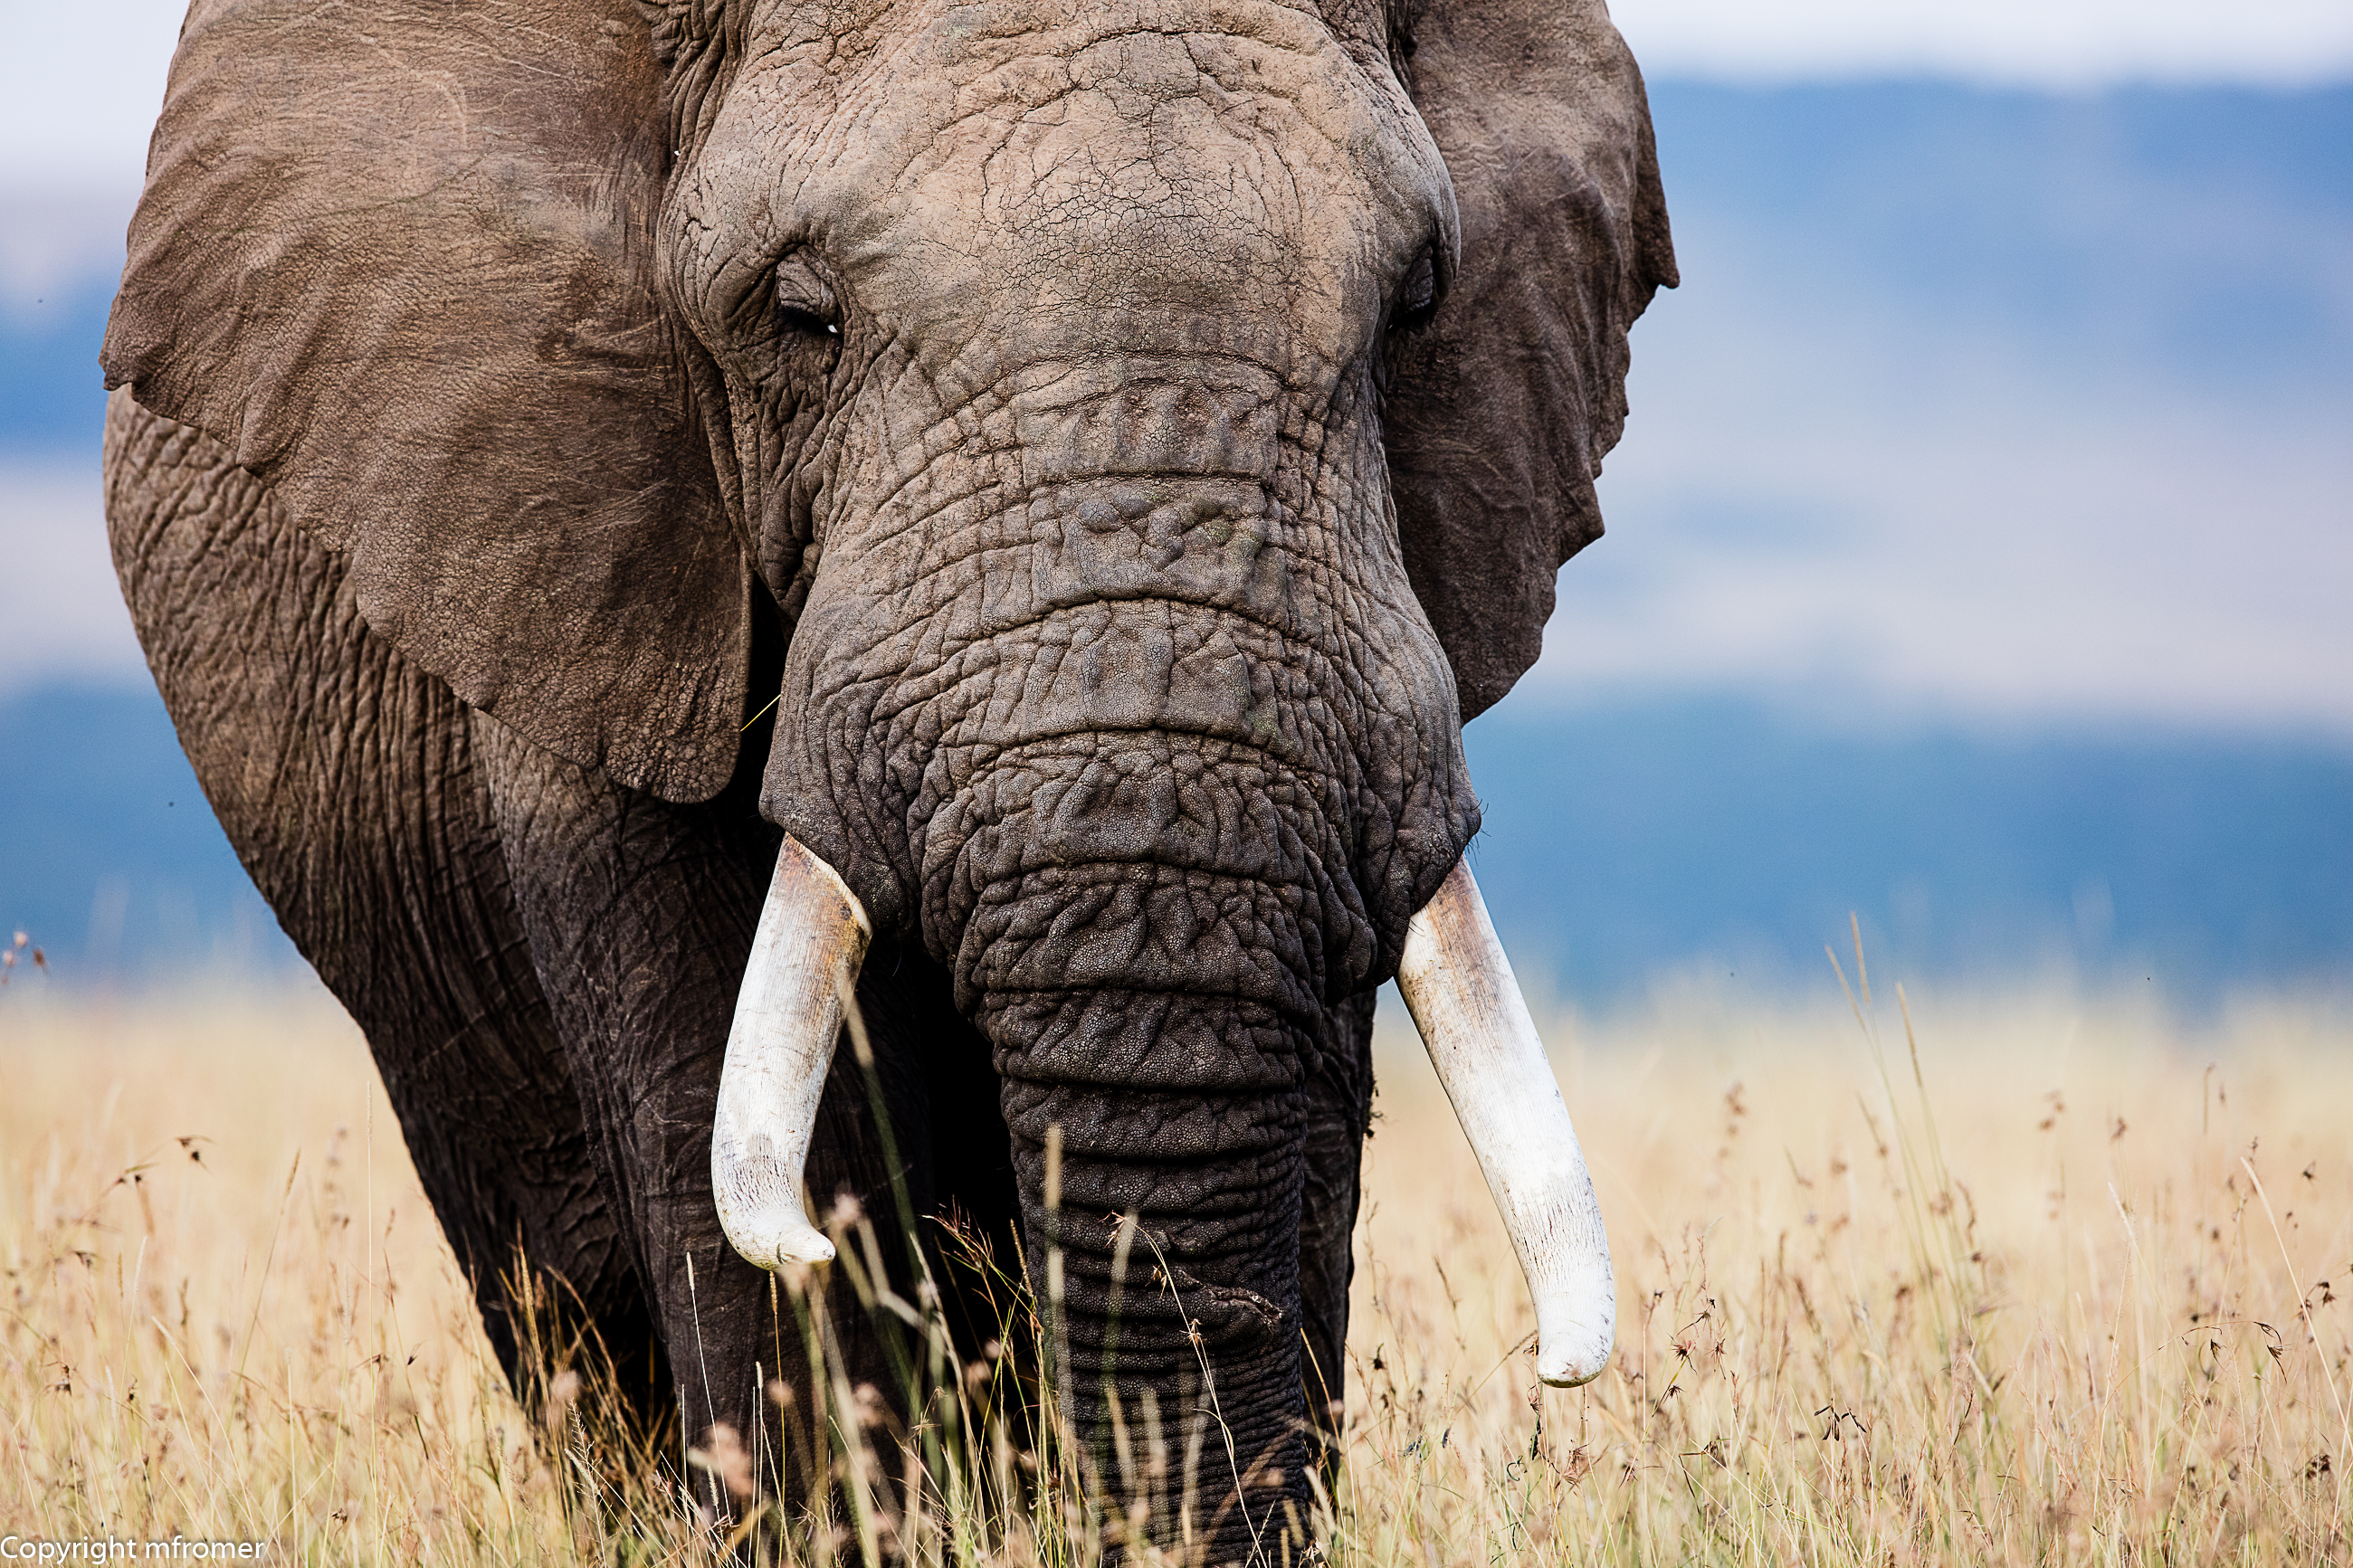 African elephant in the Maasai Mara